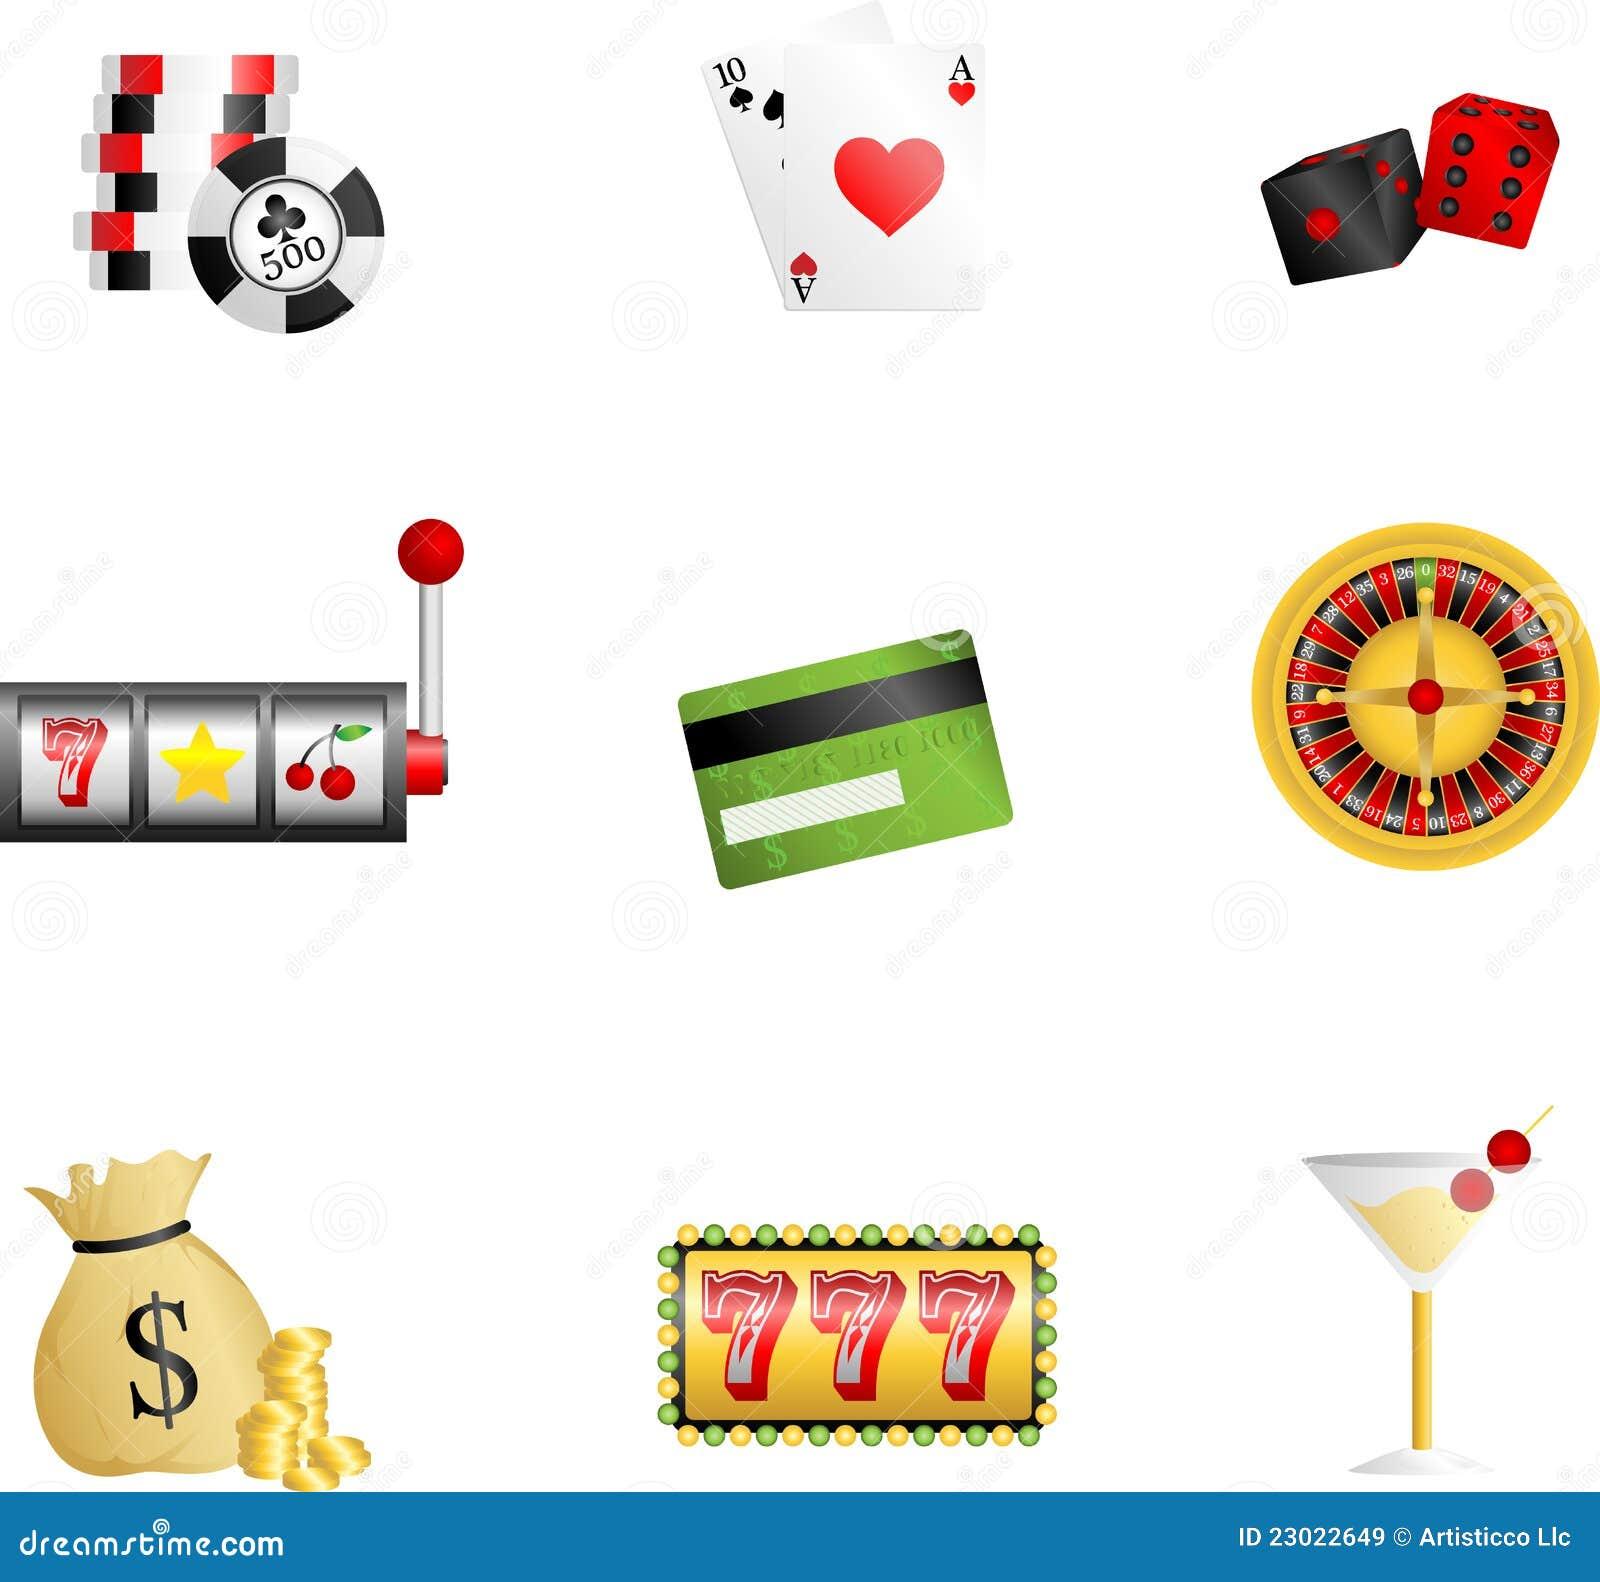 Free gambling picture address sands casino bethlehem pa